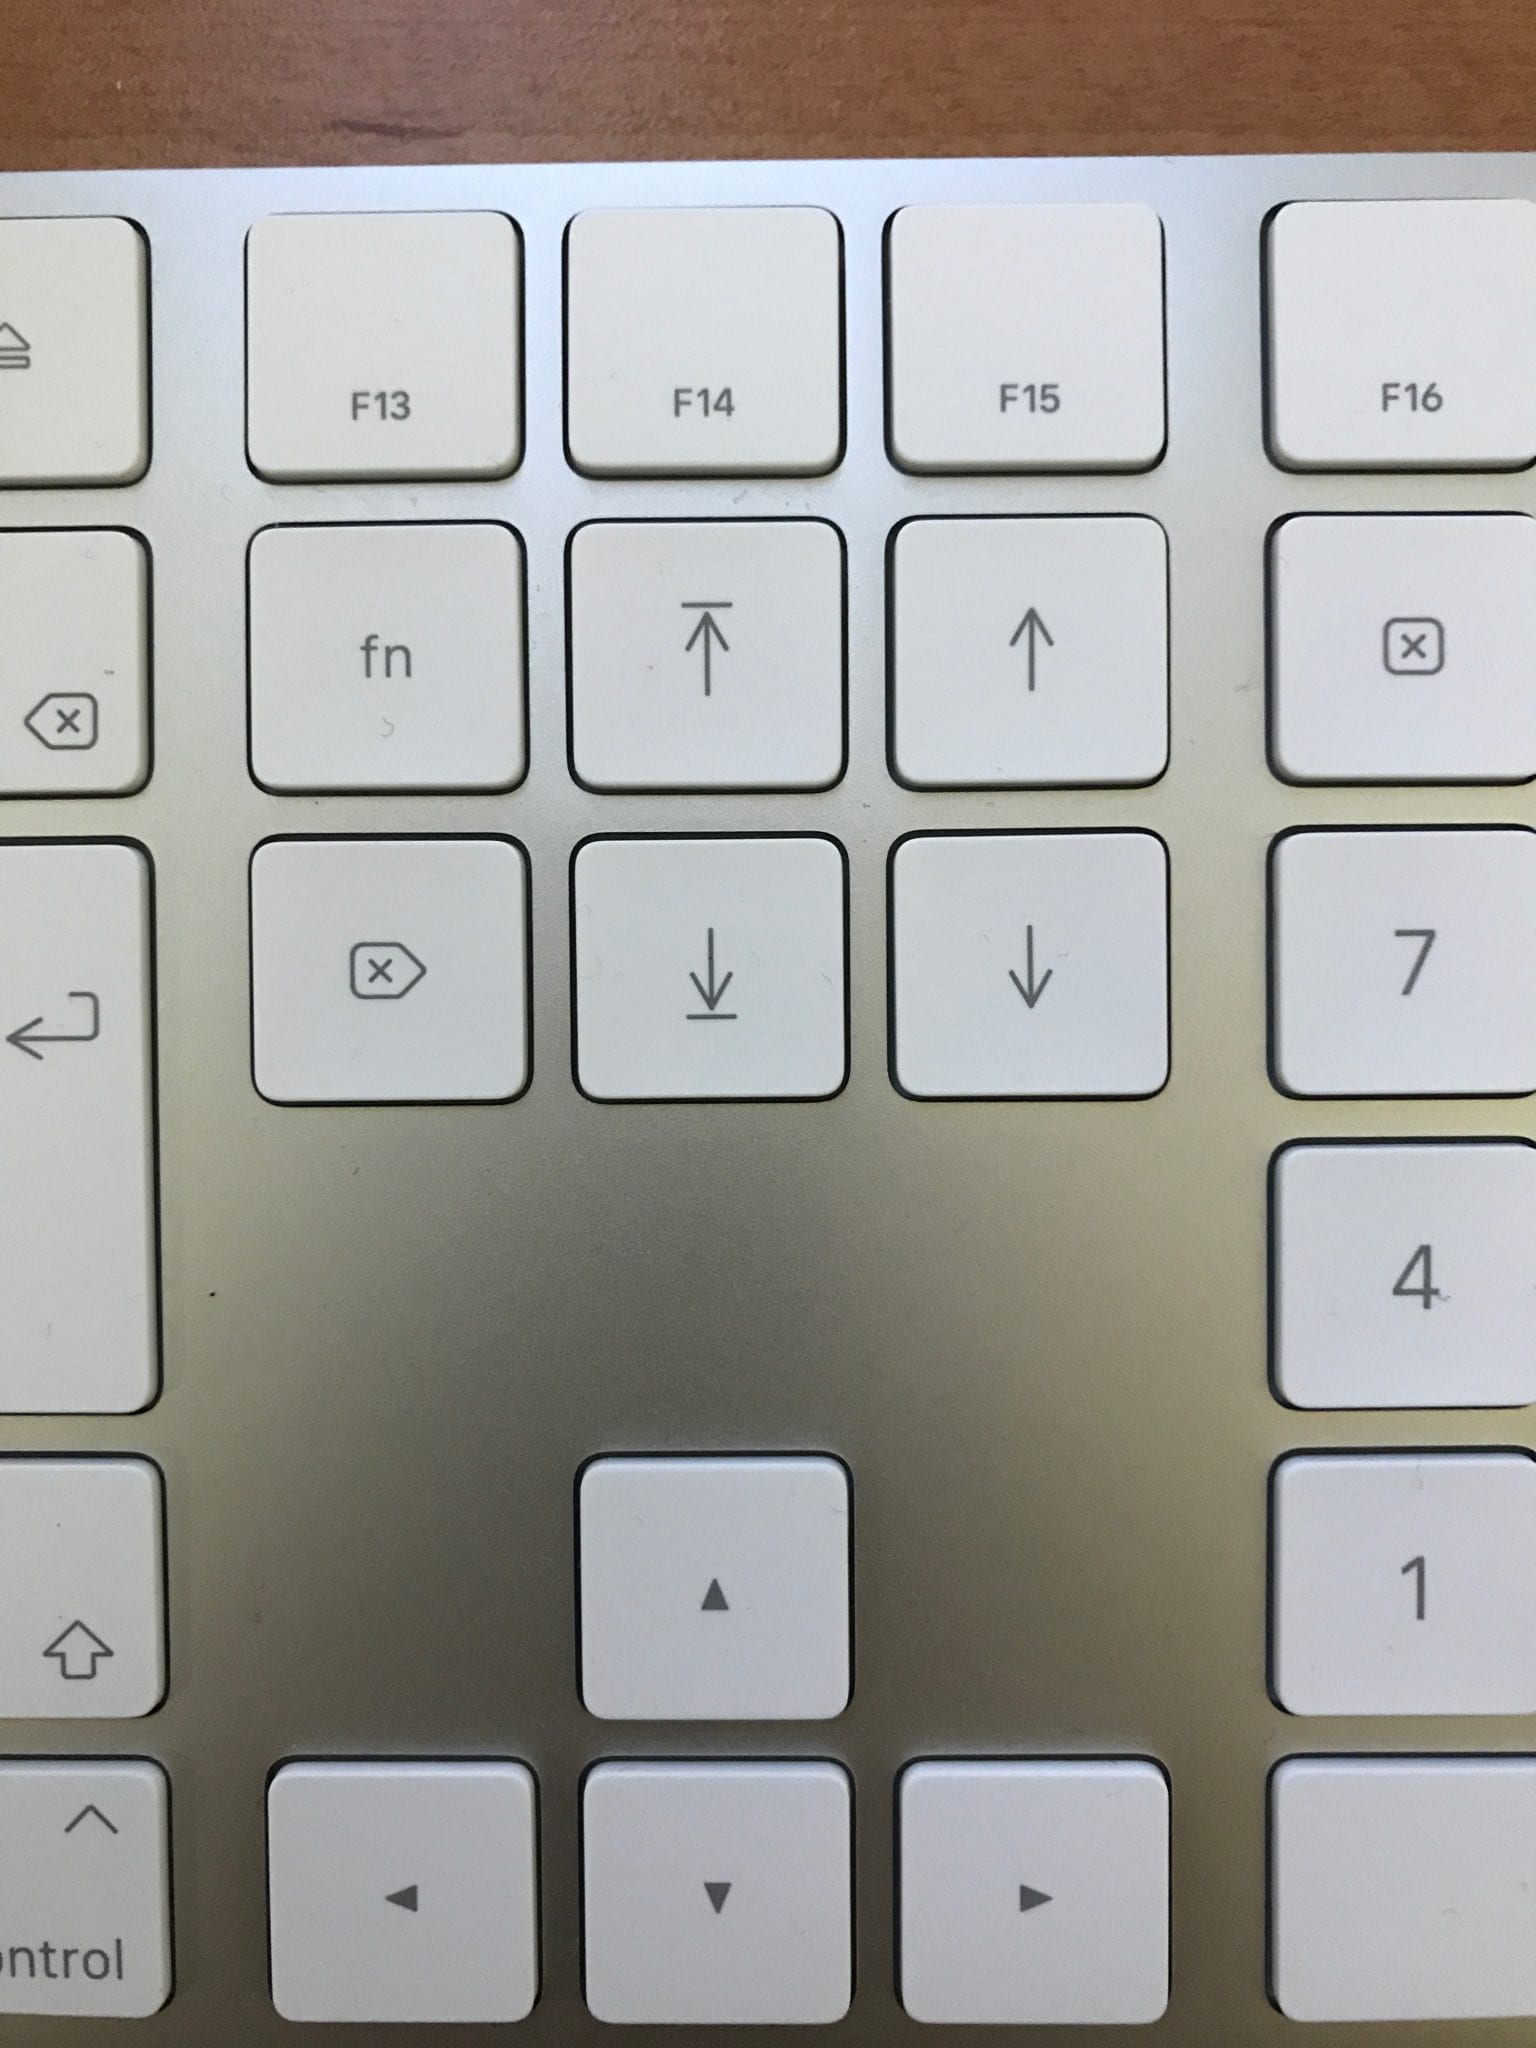 IMG 1688 - Recenzia: Magic Keyboard s numerickými klávesami